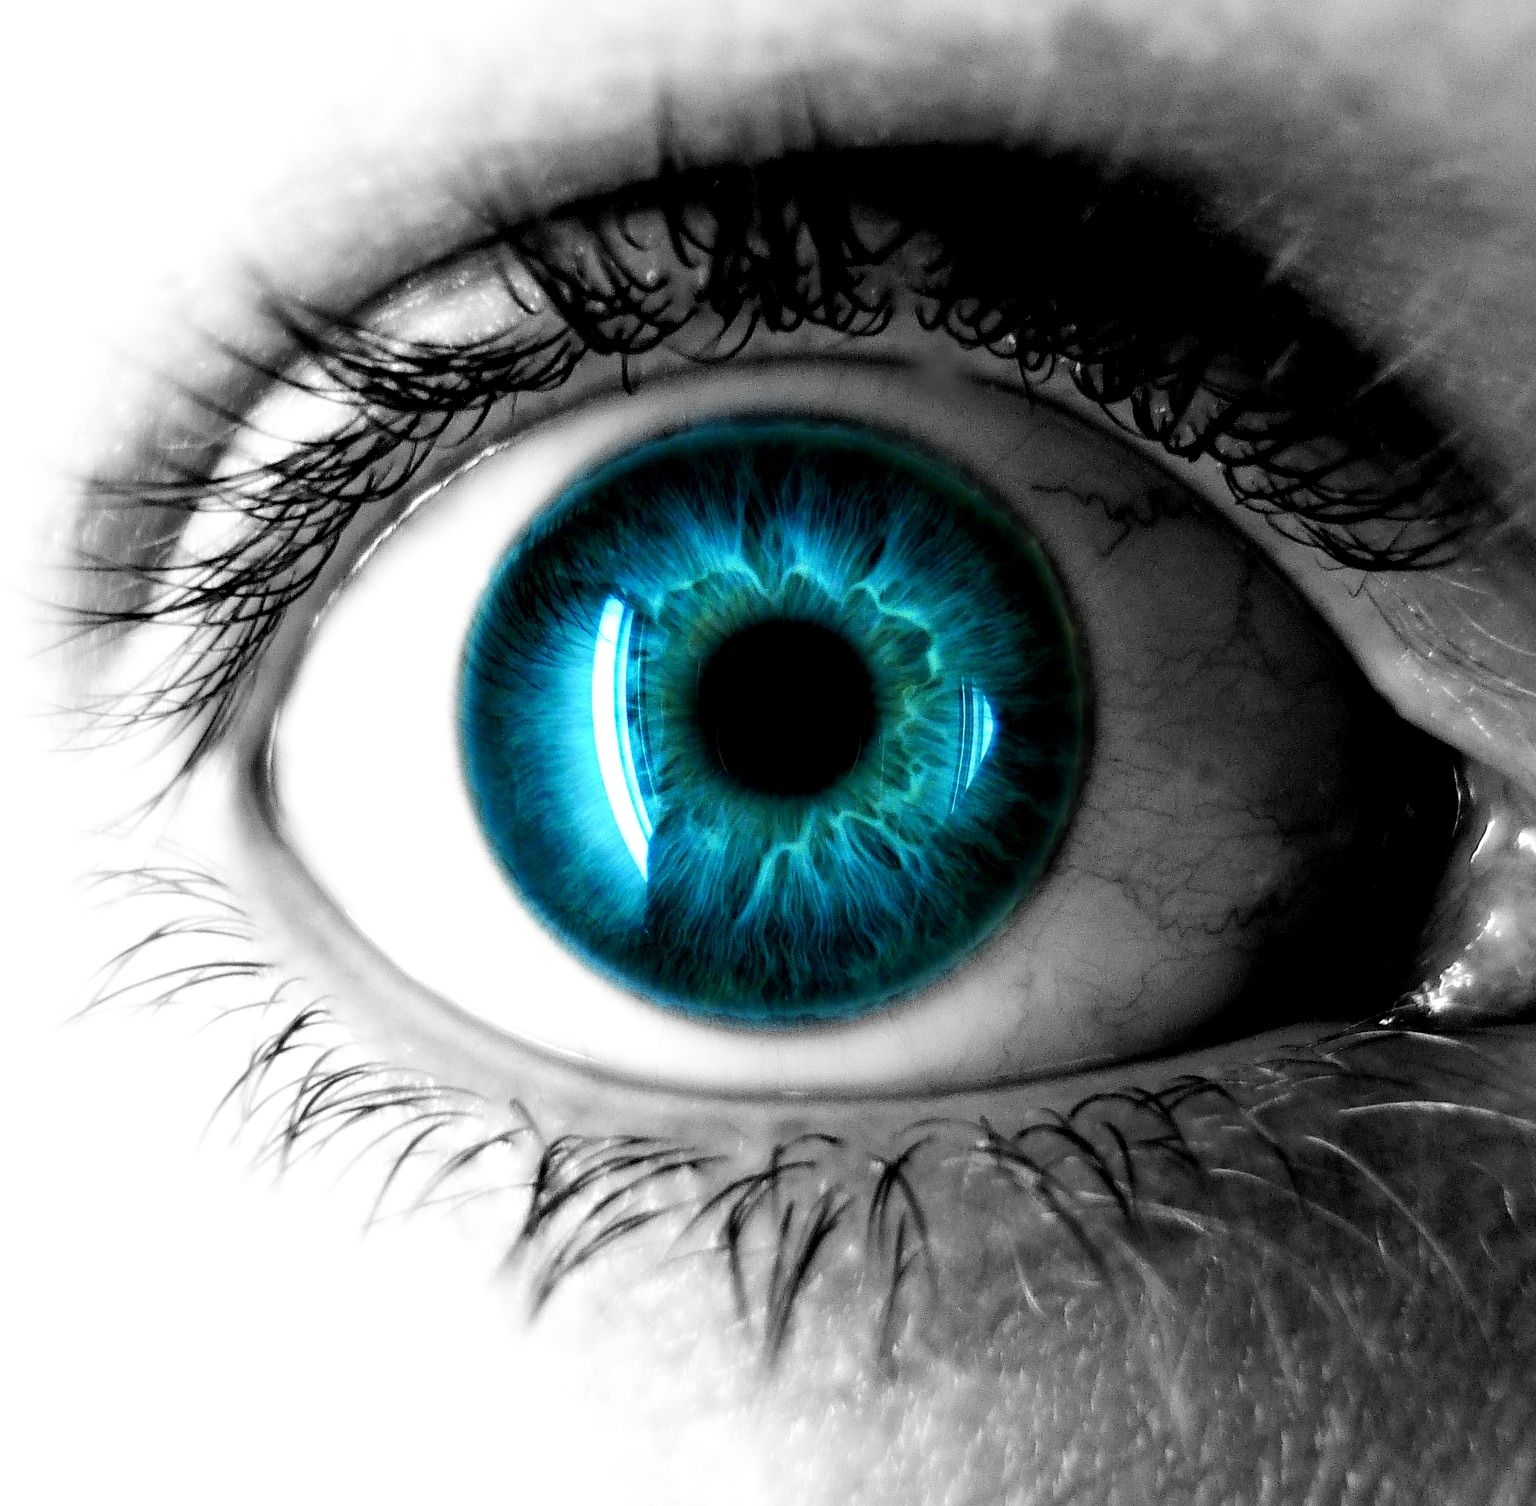 cool eyeball Wallpaper HD Download cool eyeball